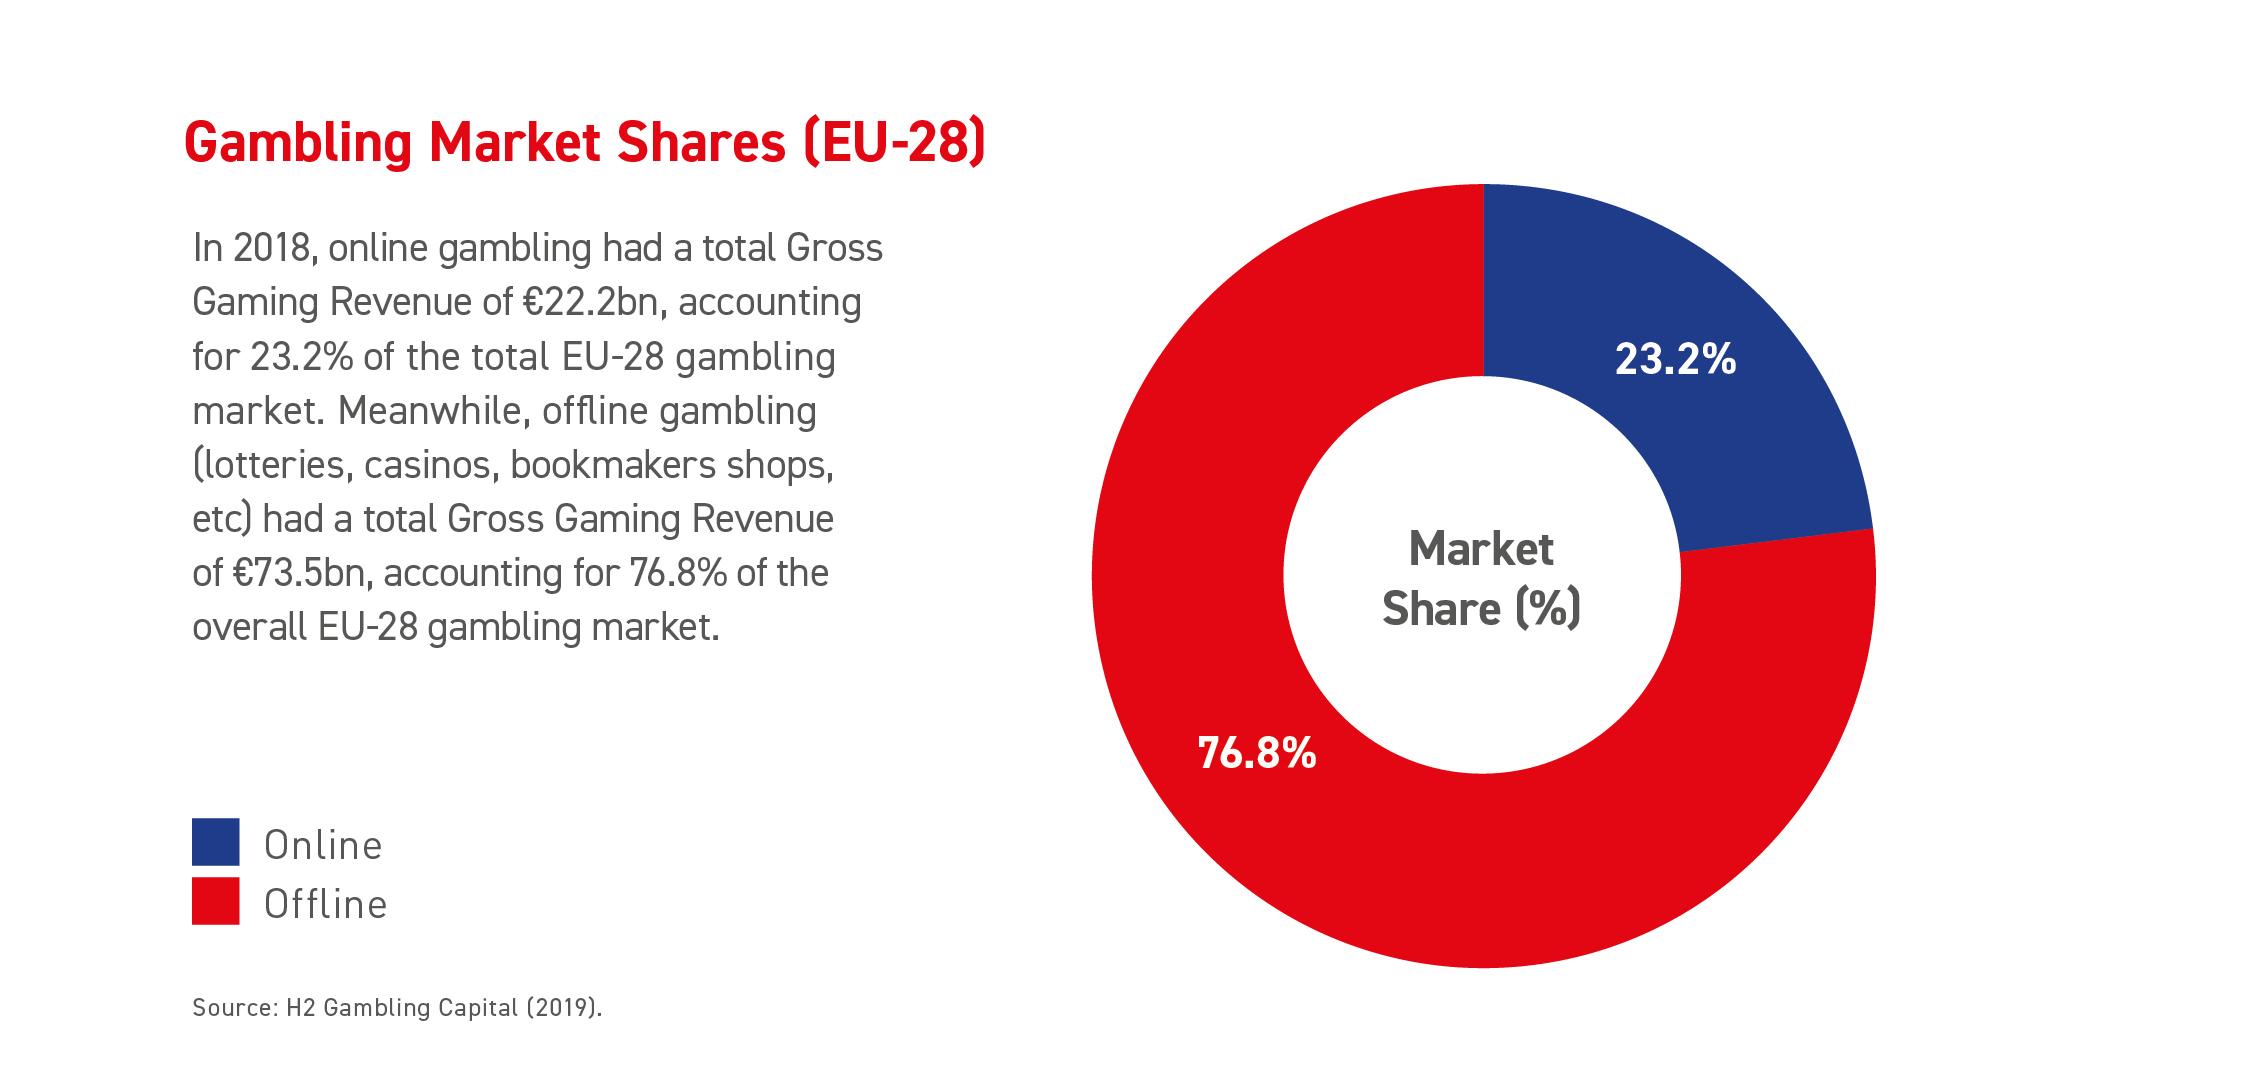 Gambling Market Shares (2018) (EU-28)